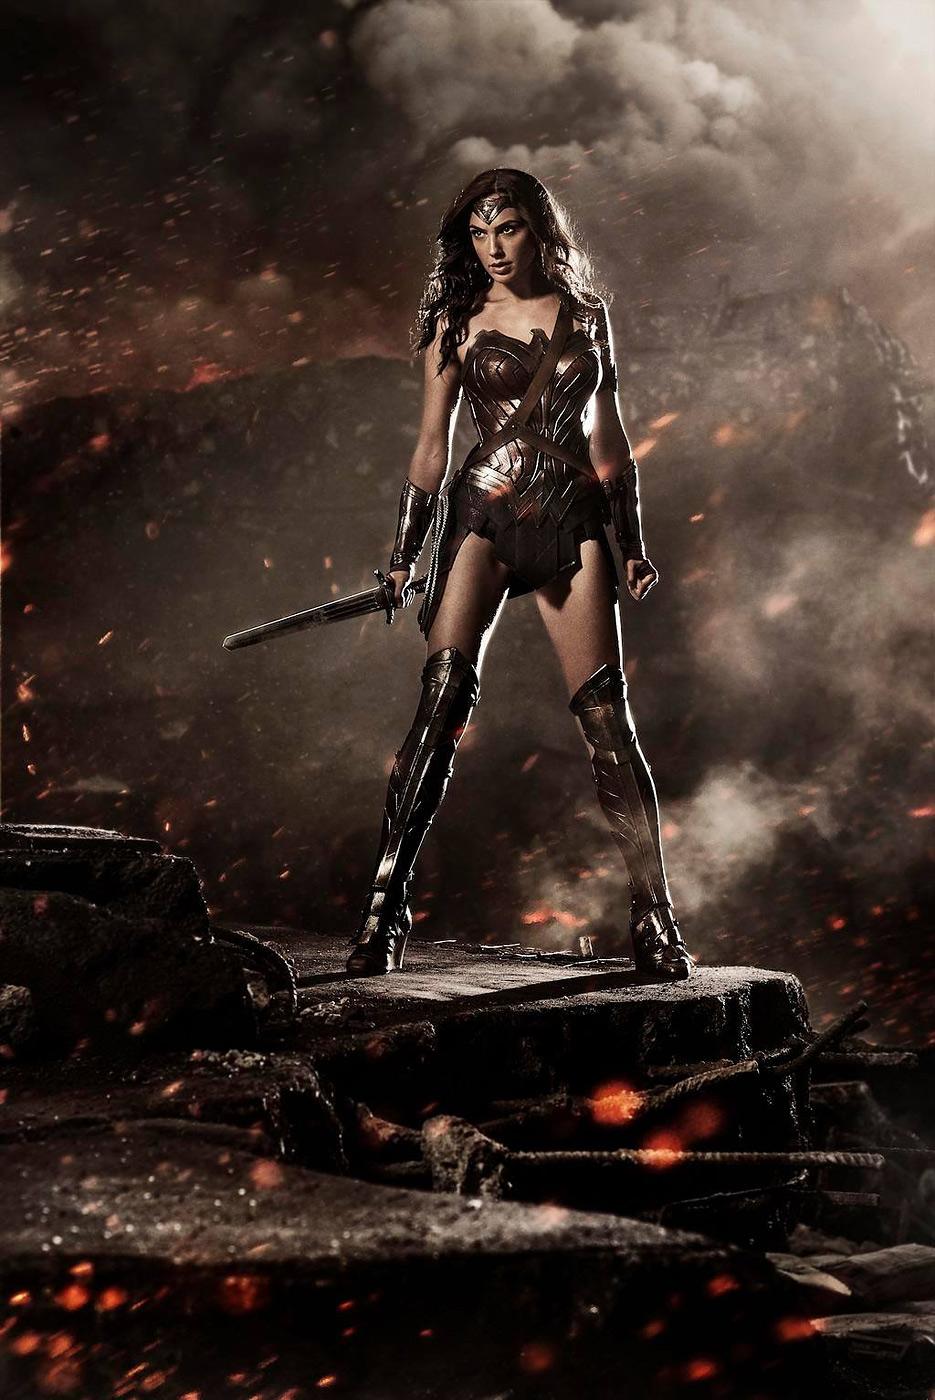 Gal Gadot as Wonder Woman in Batman v Superman: Dawn of Justice